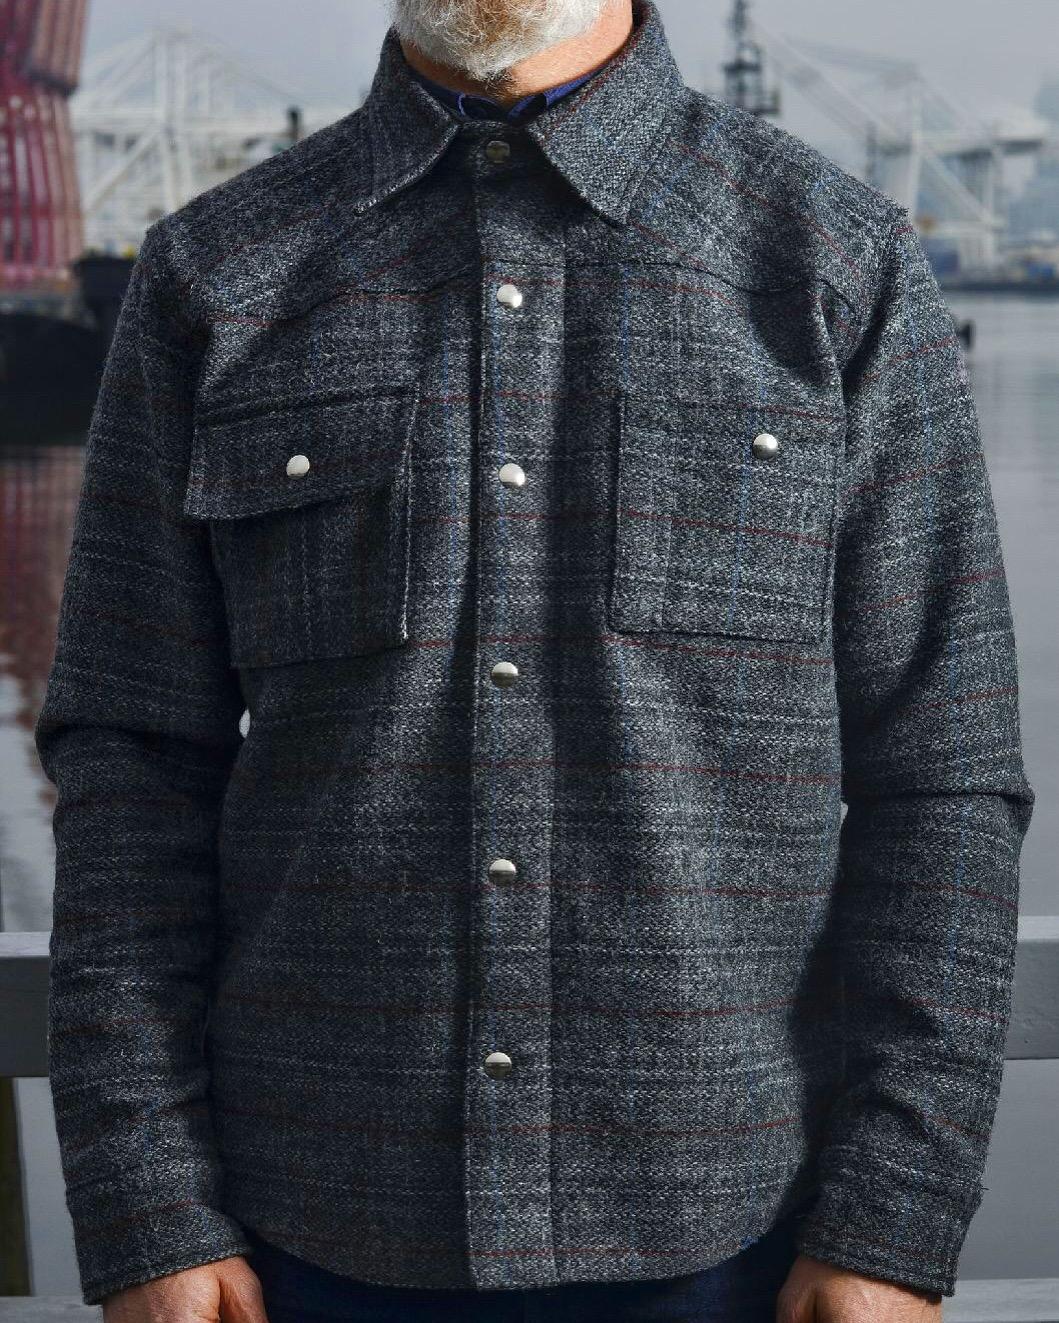 Black Bear Brand Grey Check Plaid (Harris Tweed)https://blackbearunion.com/black-bear-brand-factory-store/?category=Jackets